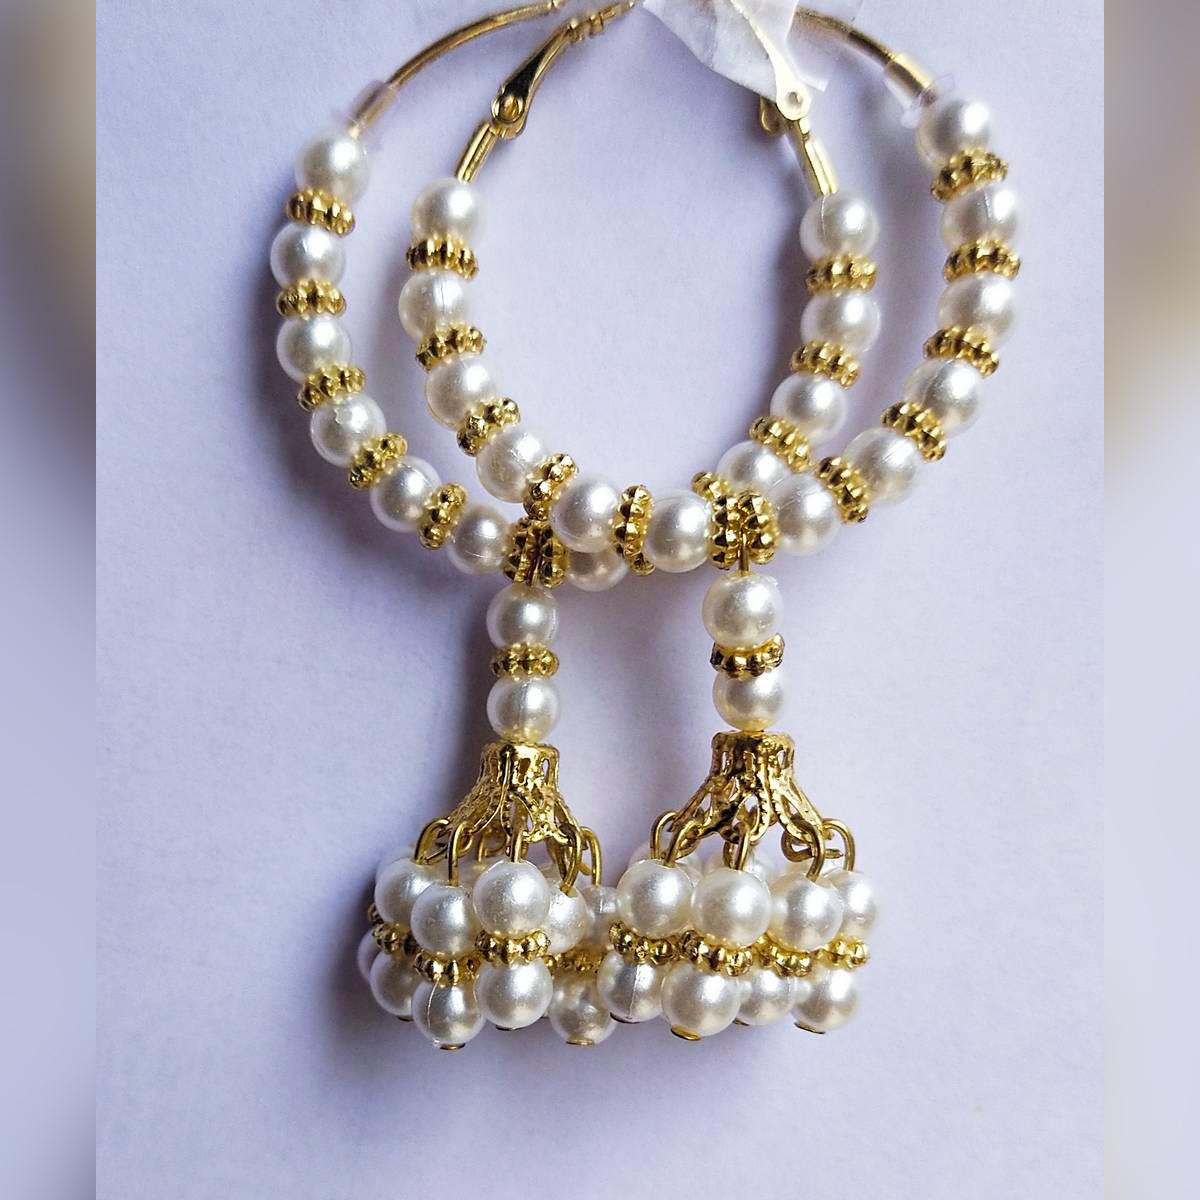 High Quality Delicate long Classy Tassel Pearls Jhumka Trendy Earring